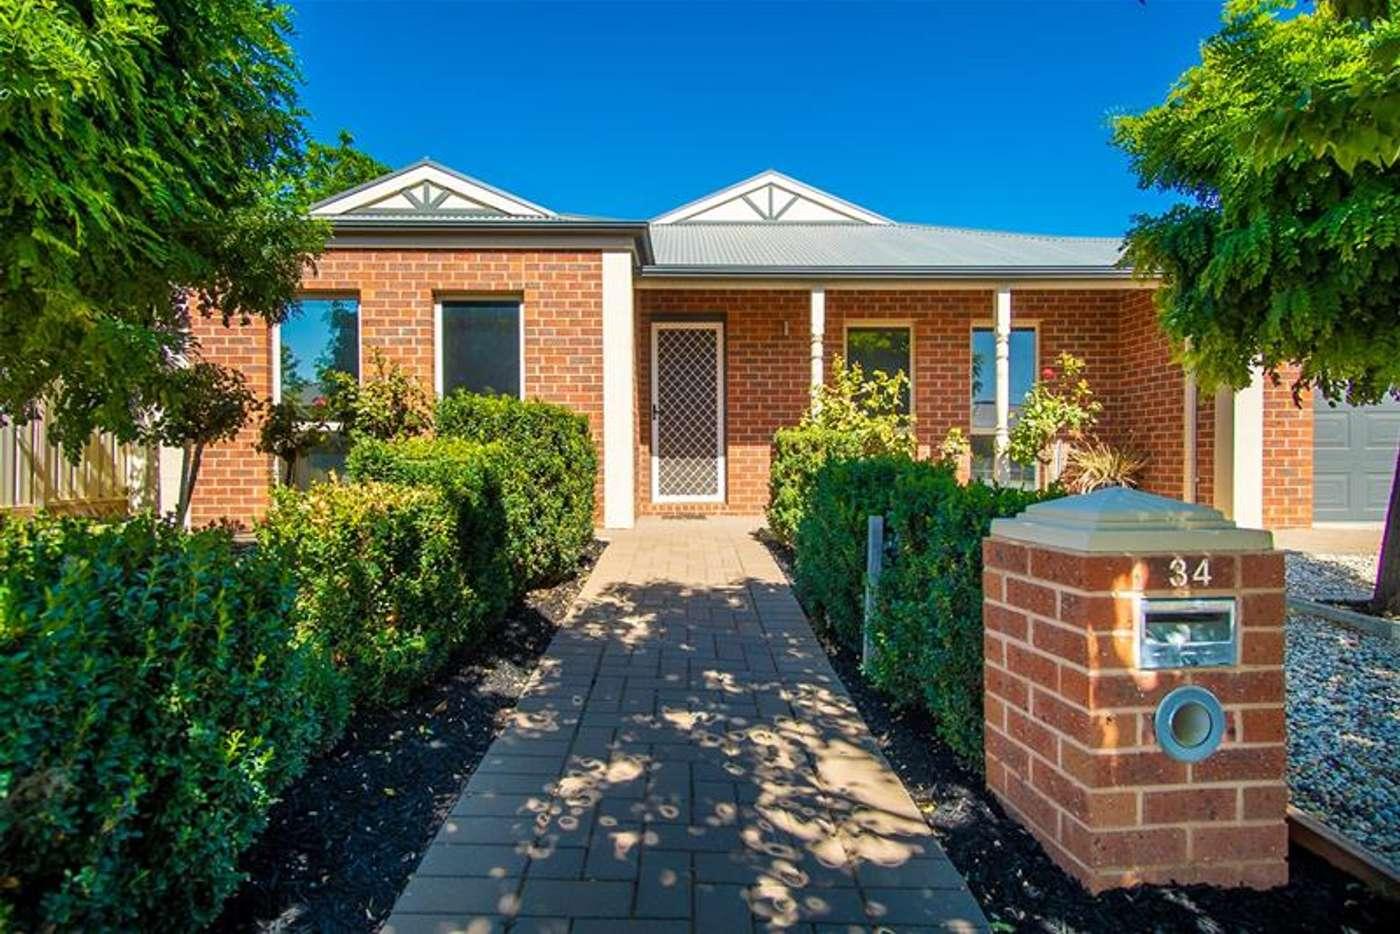 Main view of Homely house listing, 34 Wirraway Drive, Mildura VIC 3500